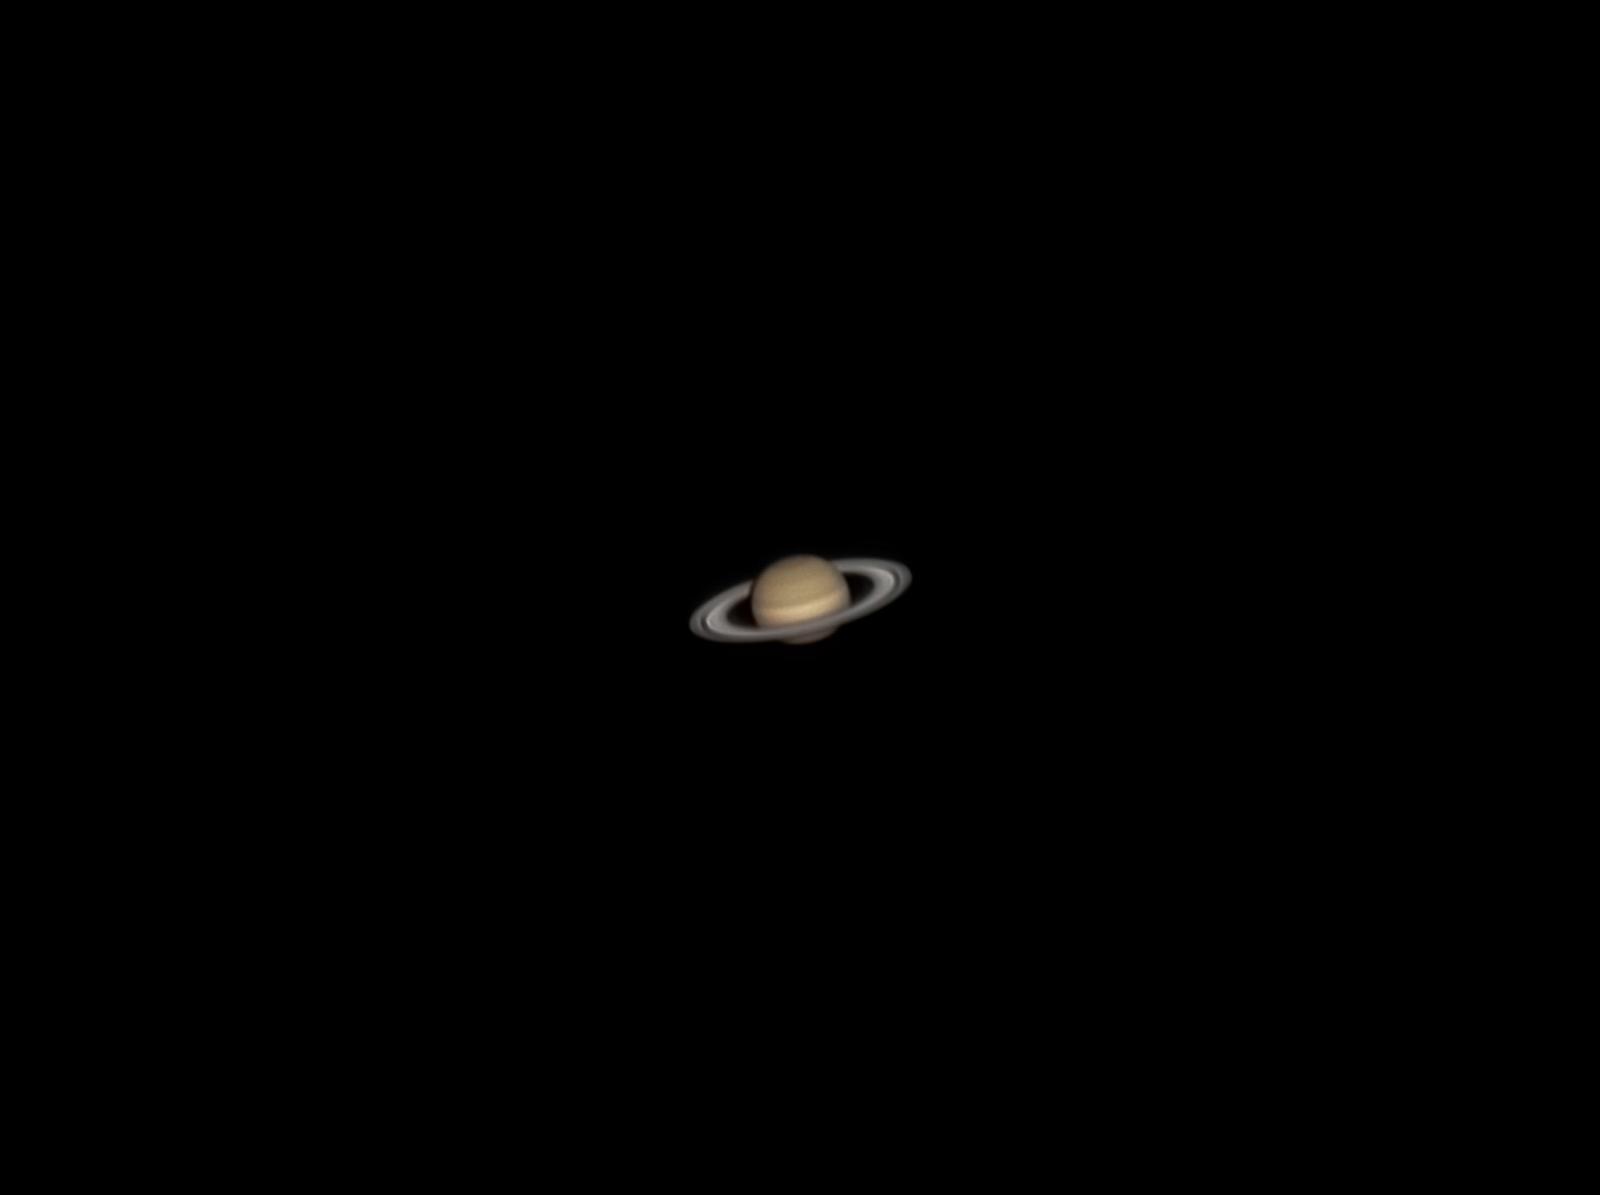 saturn-2021-6-28---004.thumb.jpg.0cc5cbc5dcc2c14c8339810738d7d608.jpg